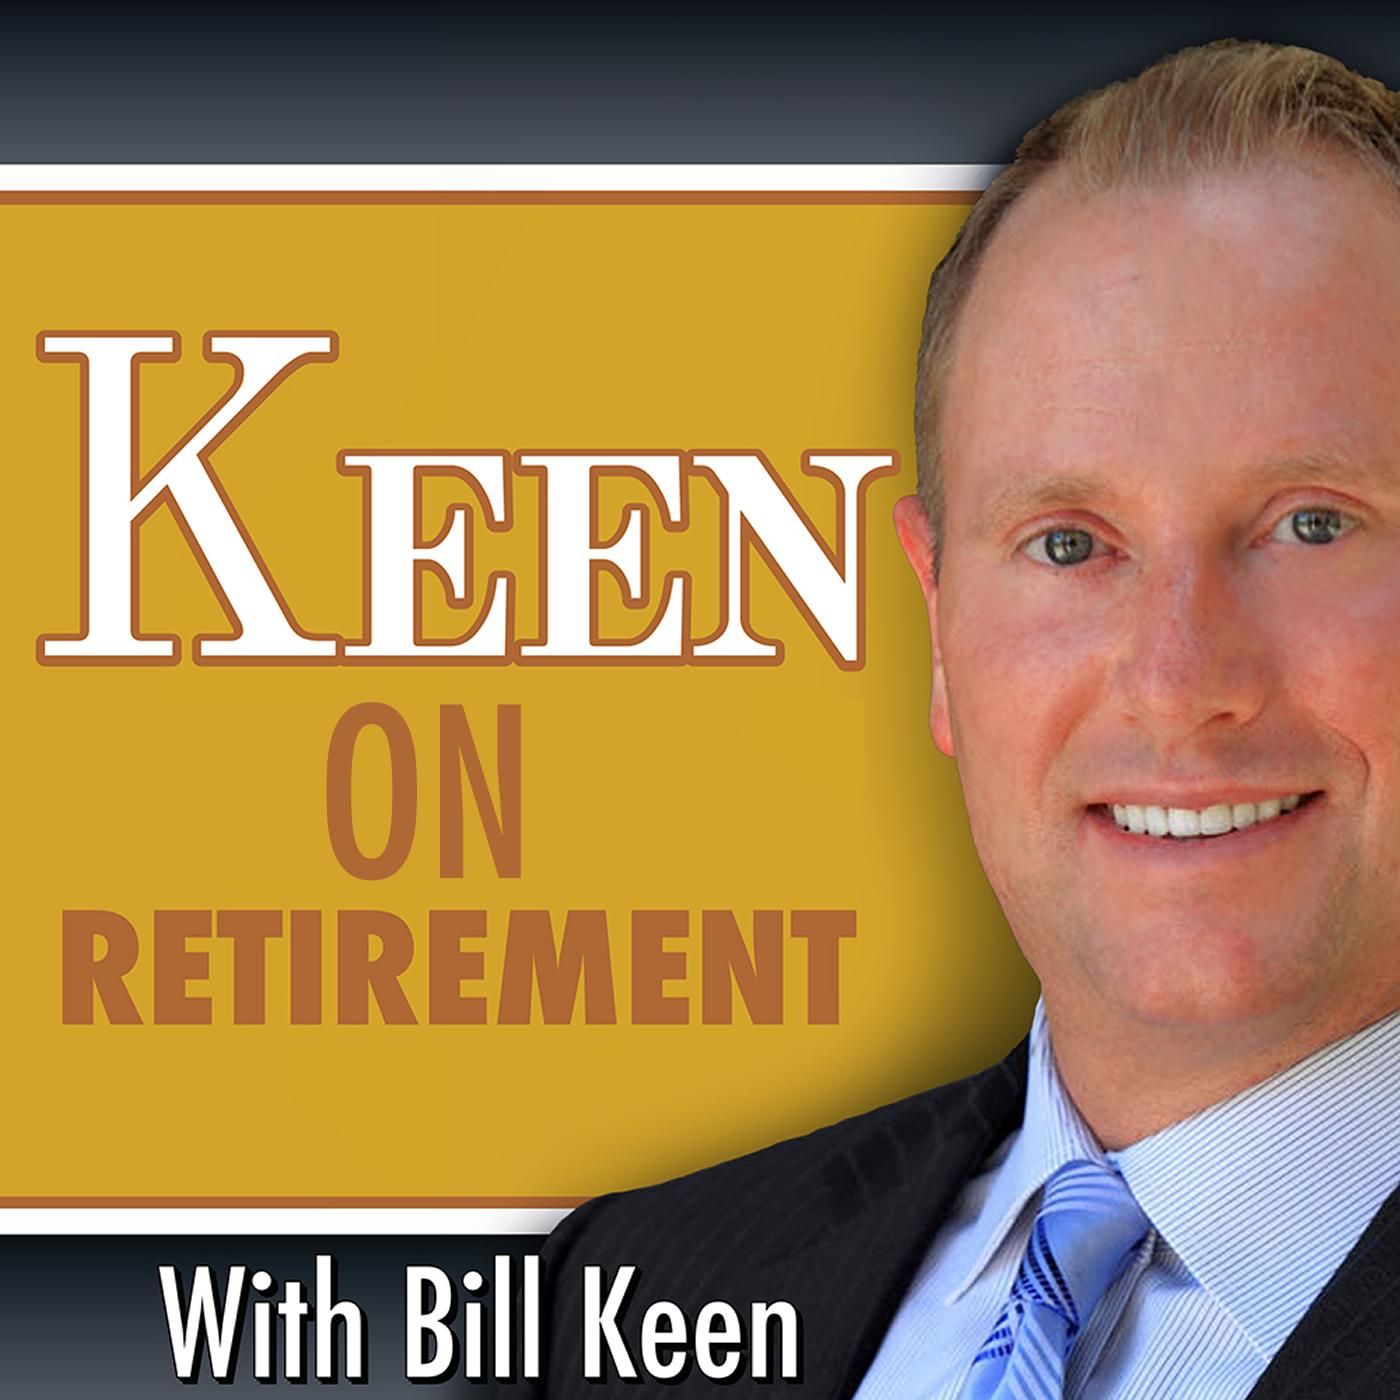 Keen on Retirement